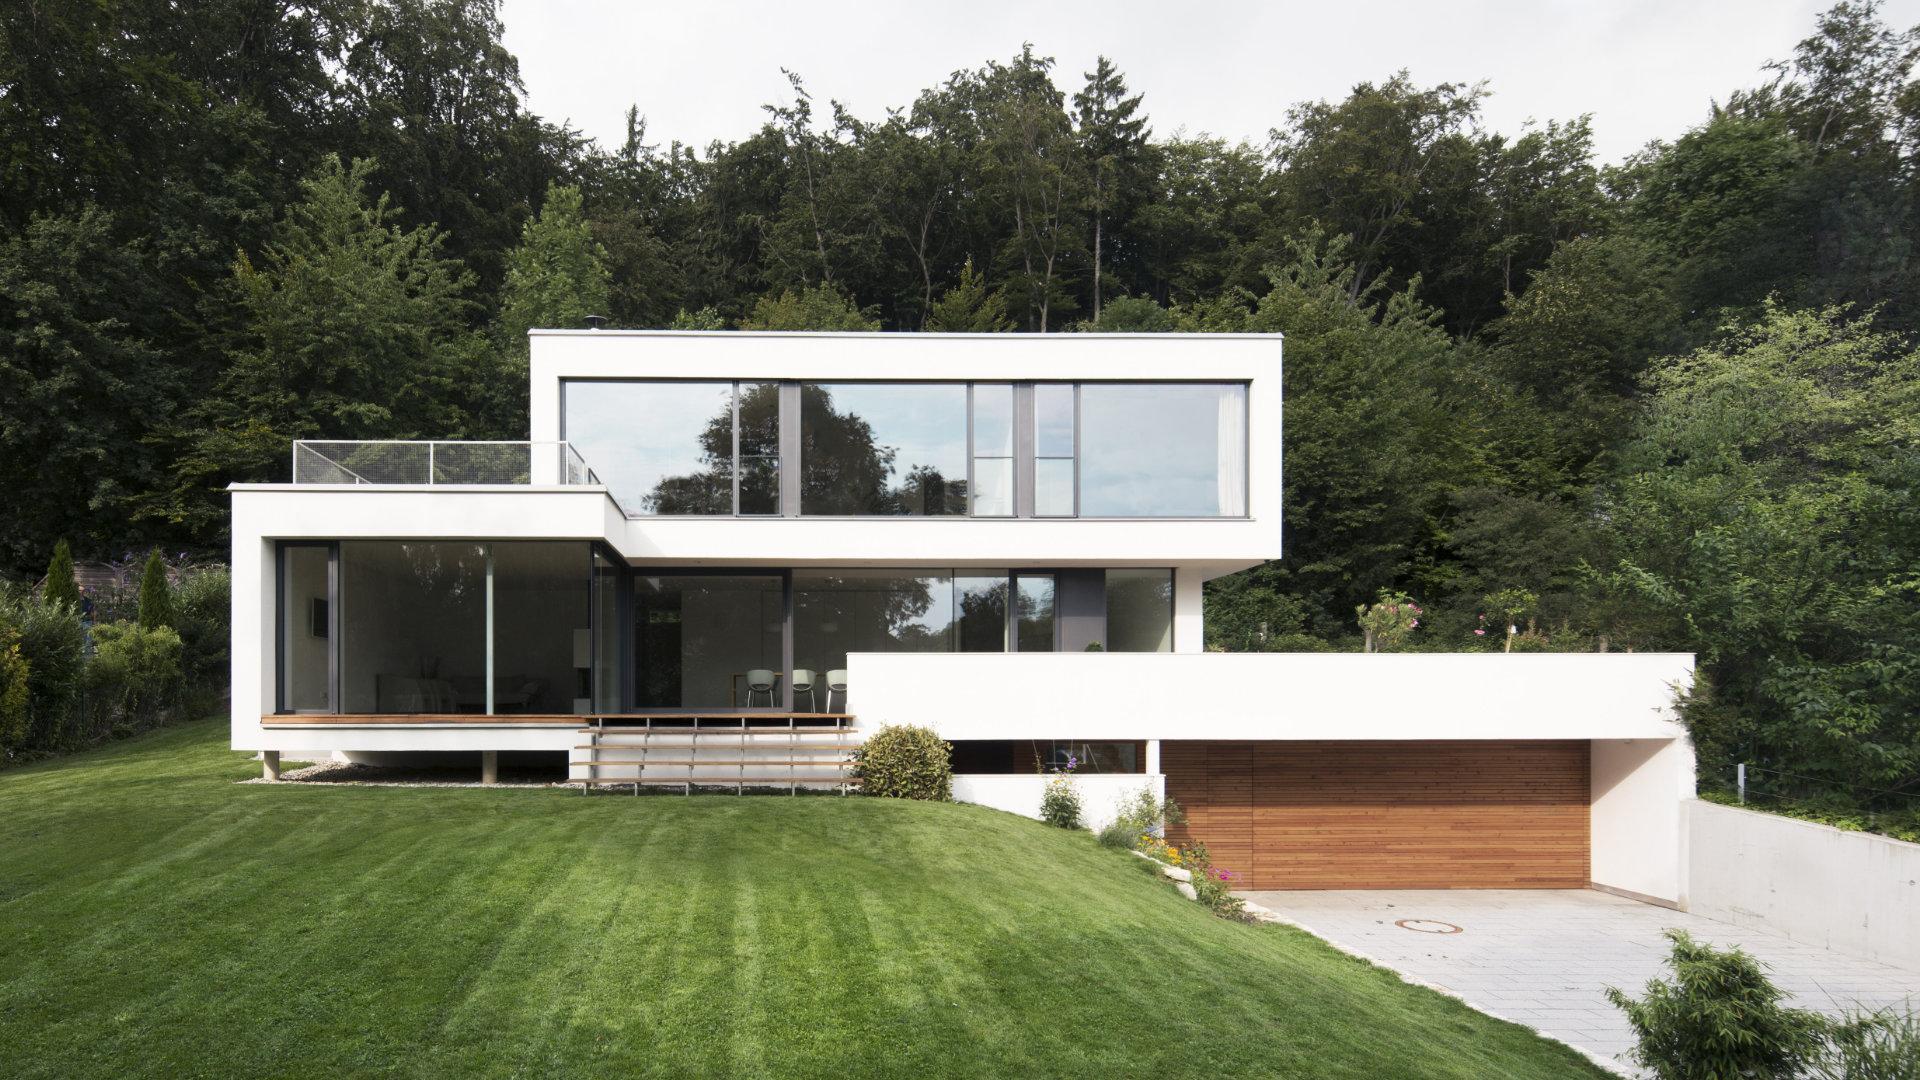 Einfamilienhaus, Wessling